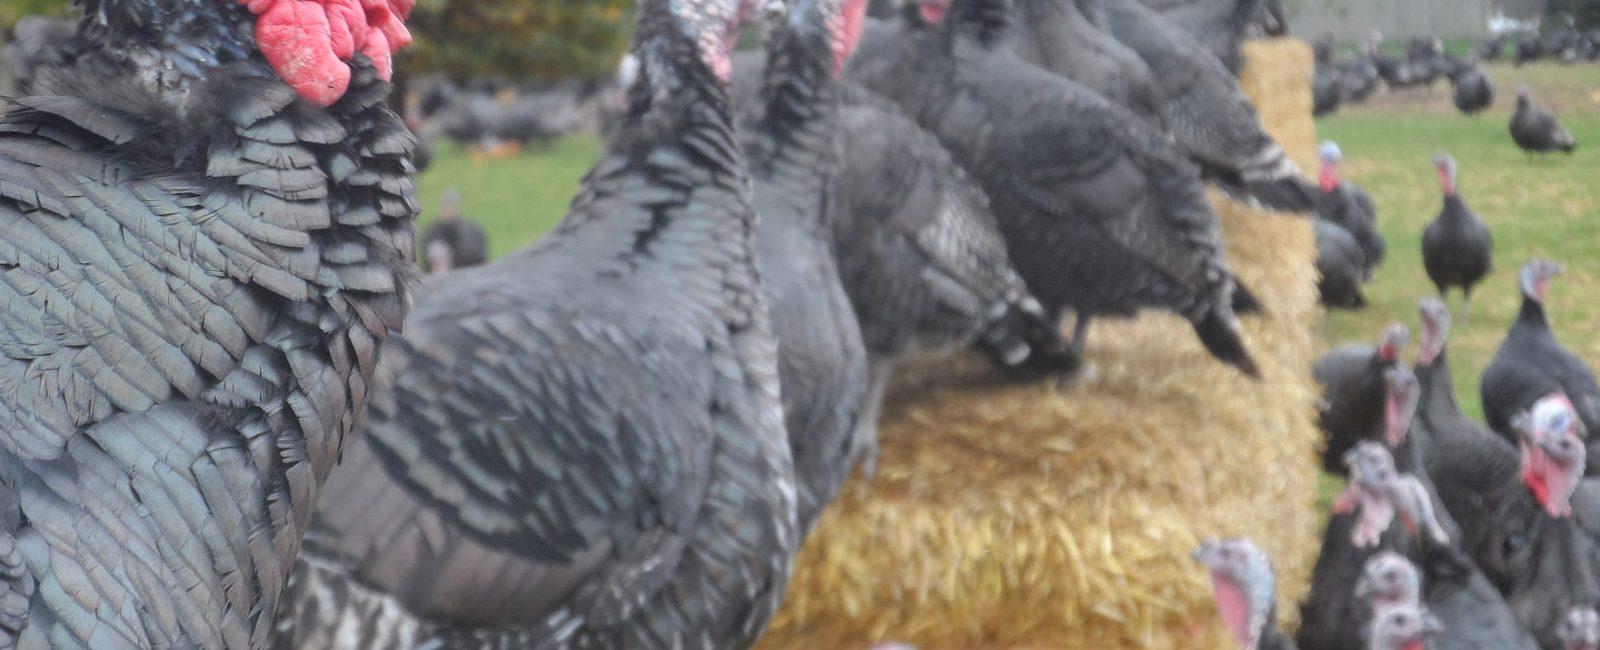 free-range-christmas-turkeys-peachcroft-farm